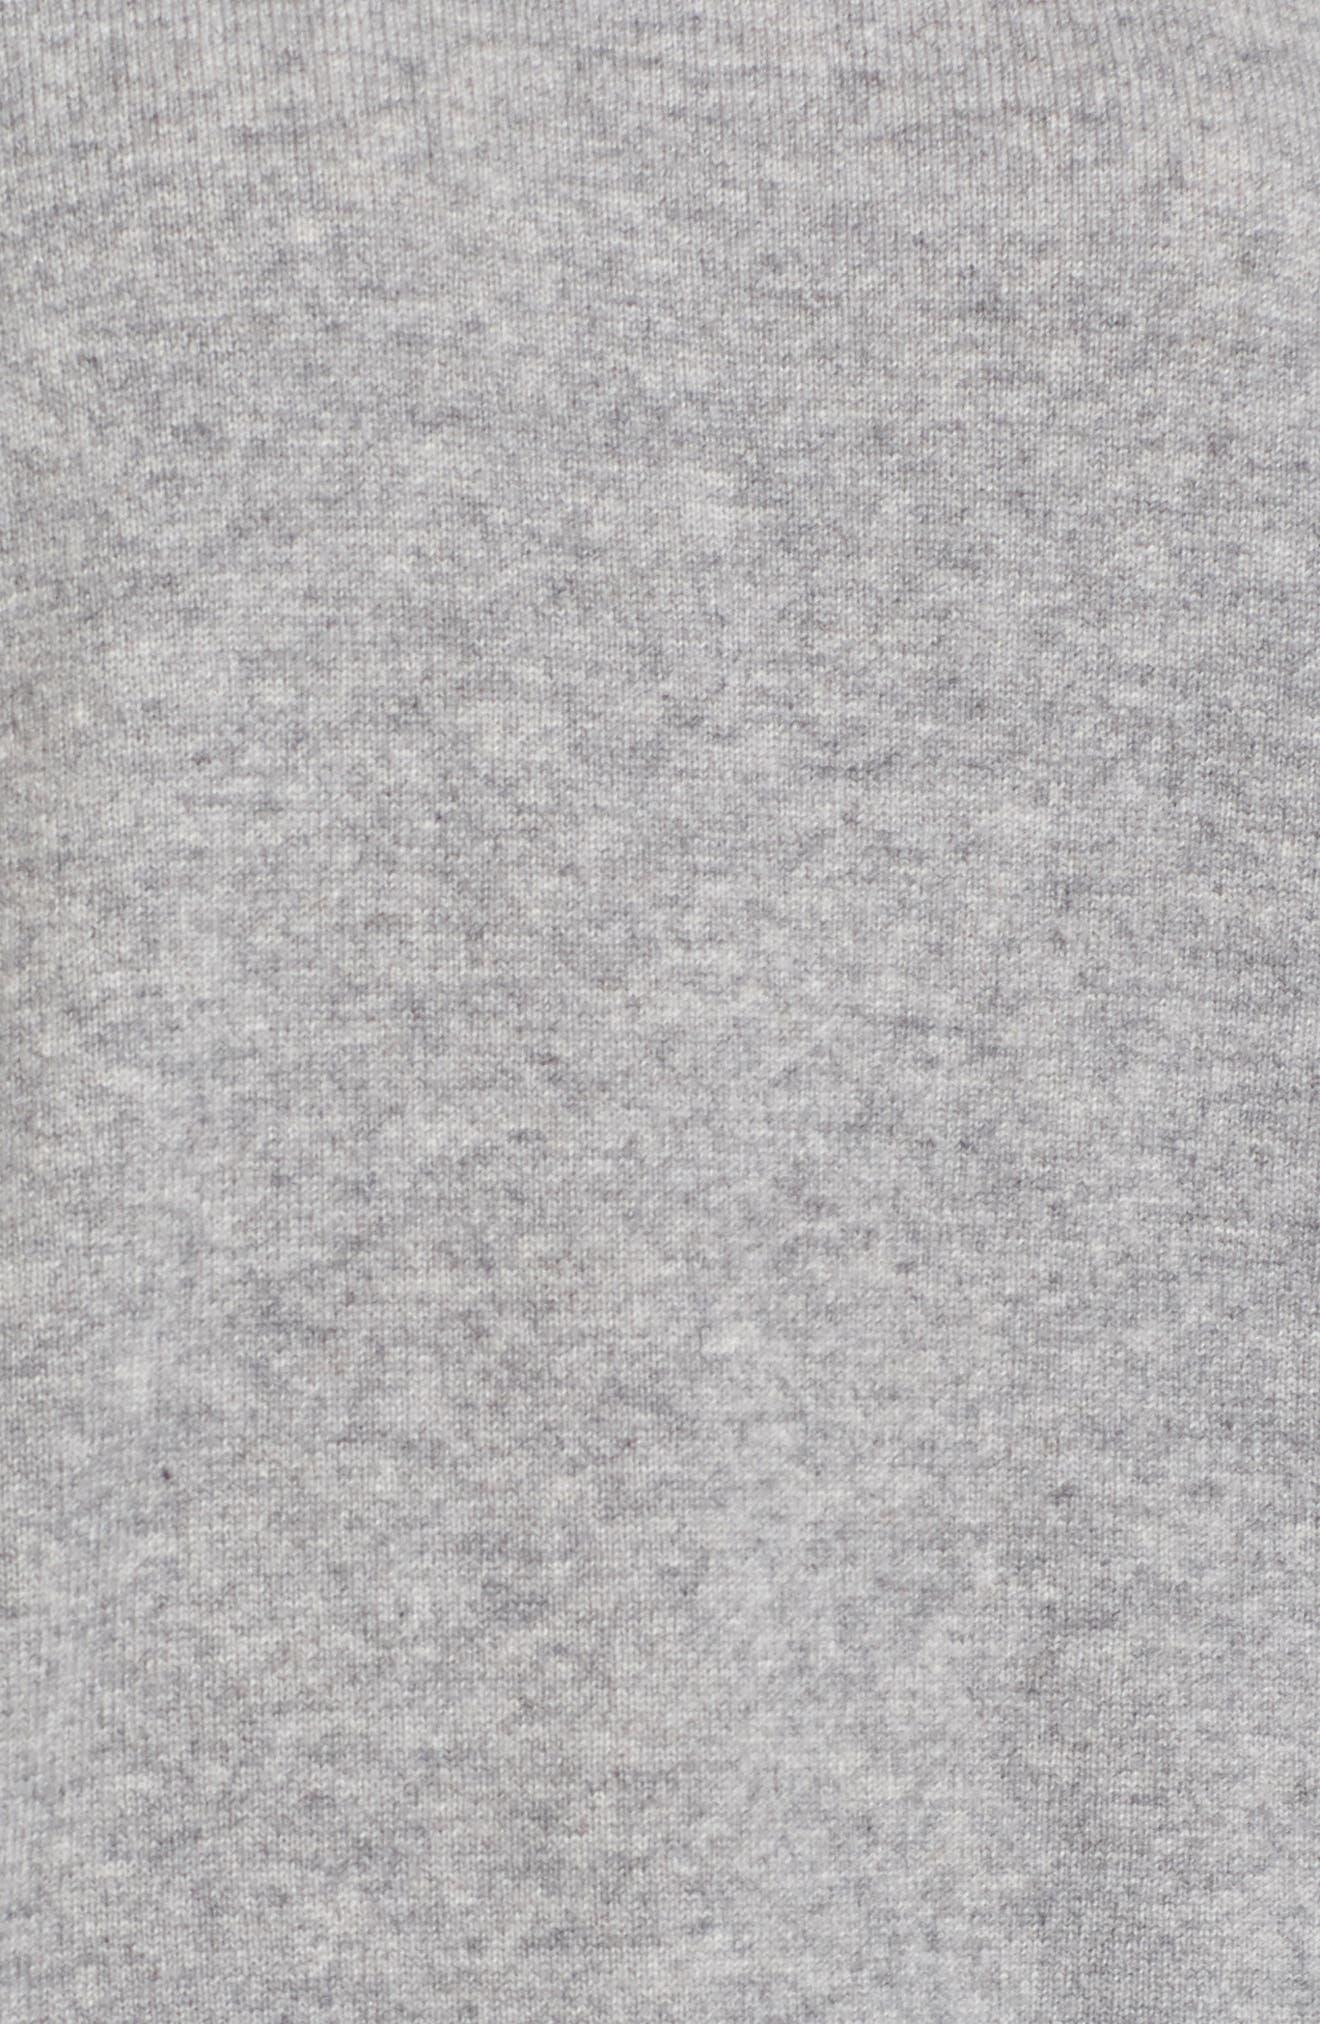 Colorblock Cashmere Sweater,                             Alternate thumbnail 5, color,                             HEATHER GREY